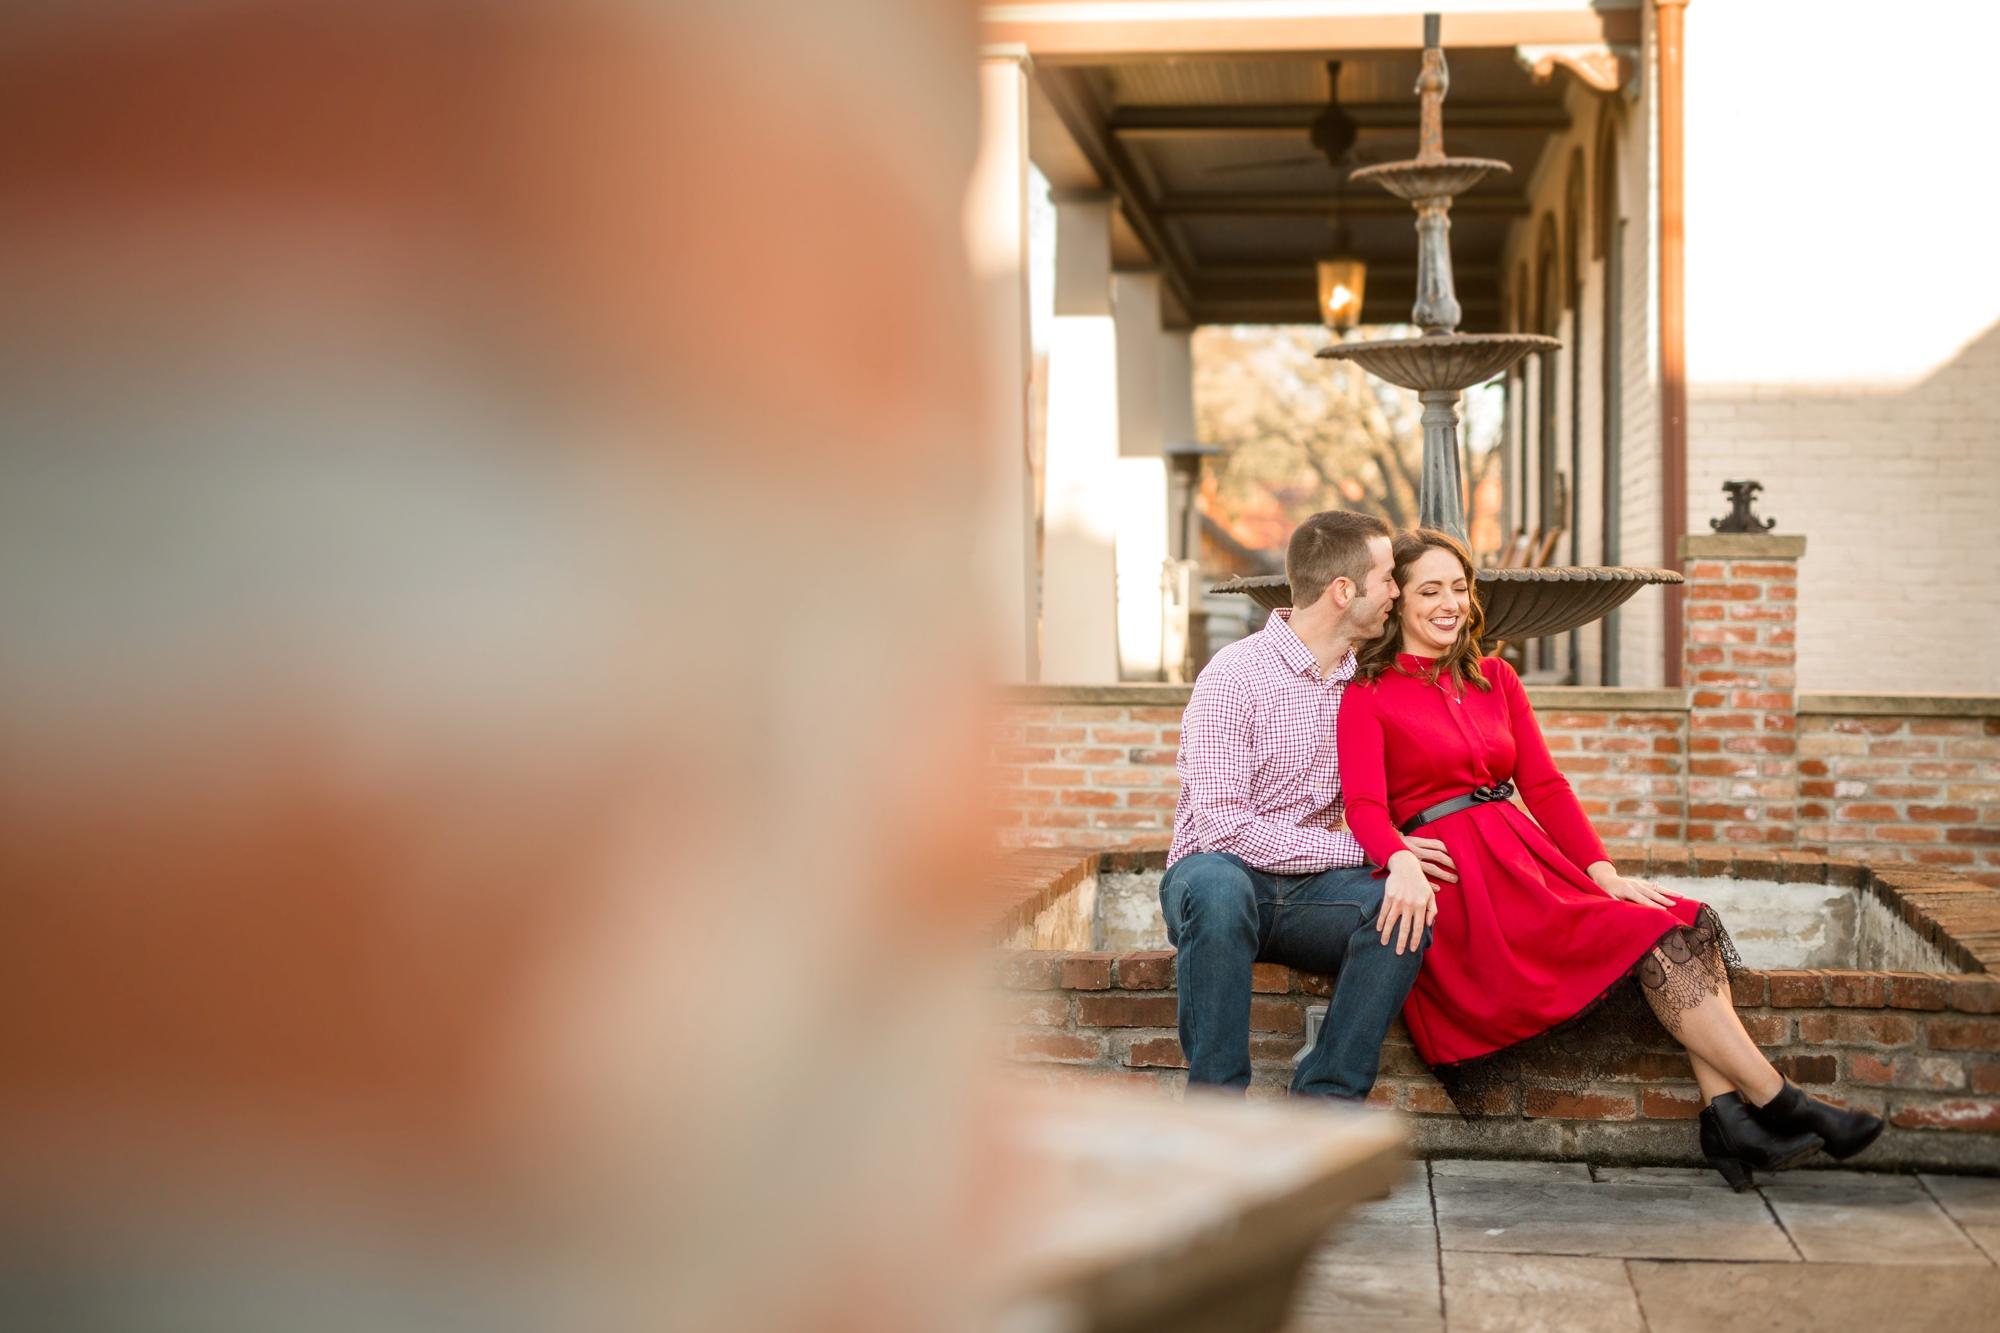 historic harmony engagement photos, harmony senior photos, harmony family photos, wunderbar coffee shop, wunderbar cafe, cranberry township wedding photographer